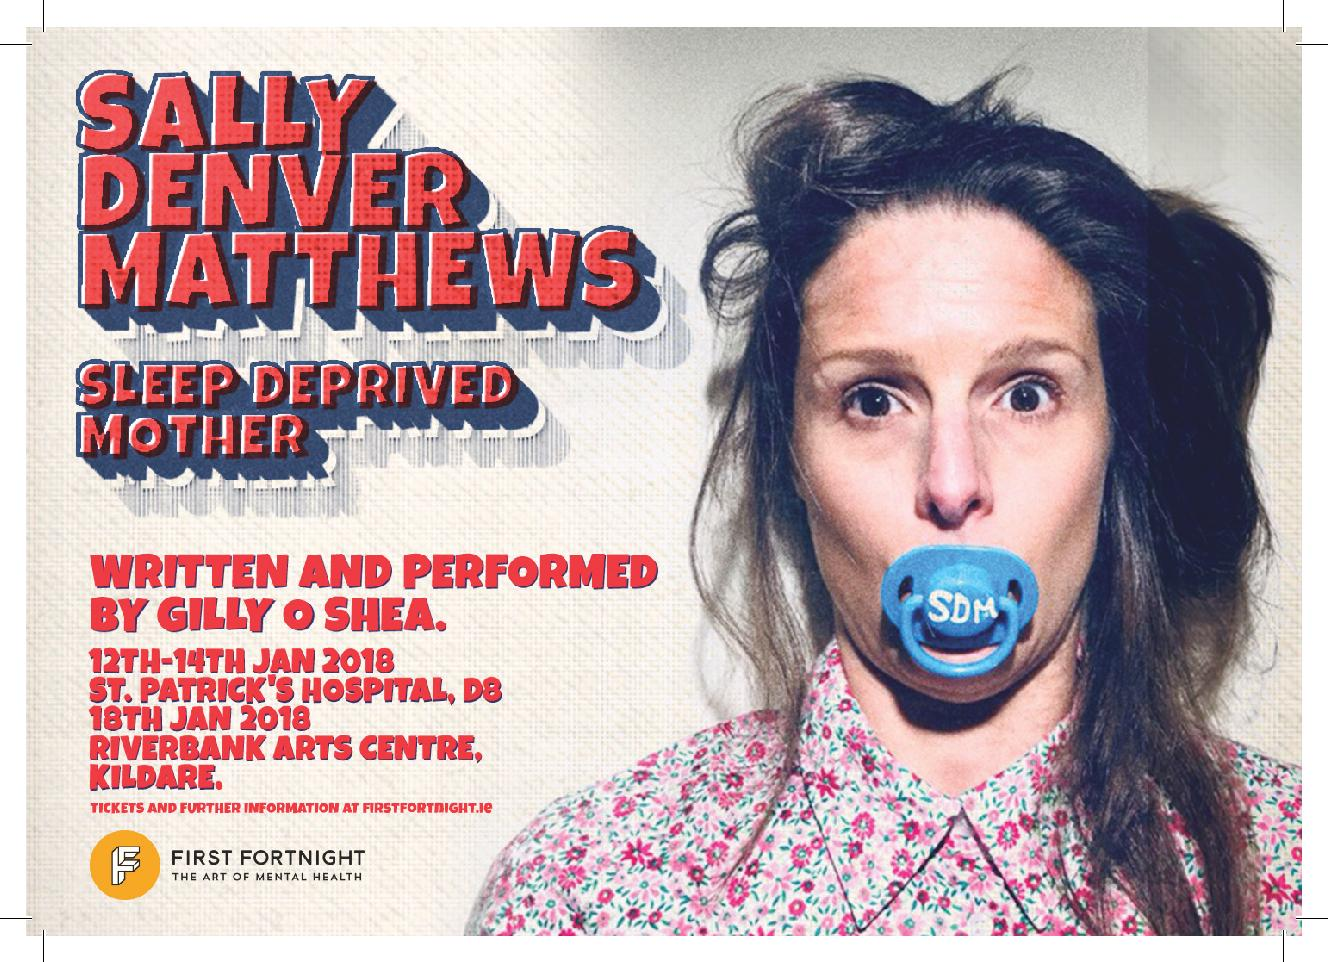 Sally Denver Matthews (1)-page-001.jpg